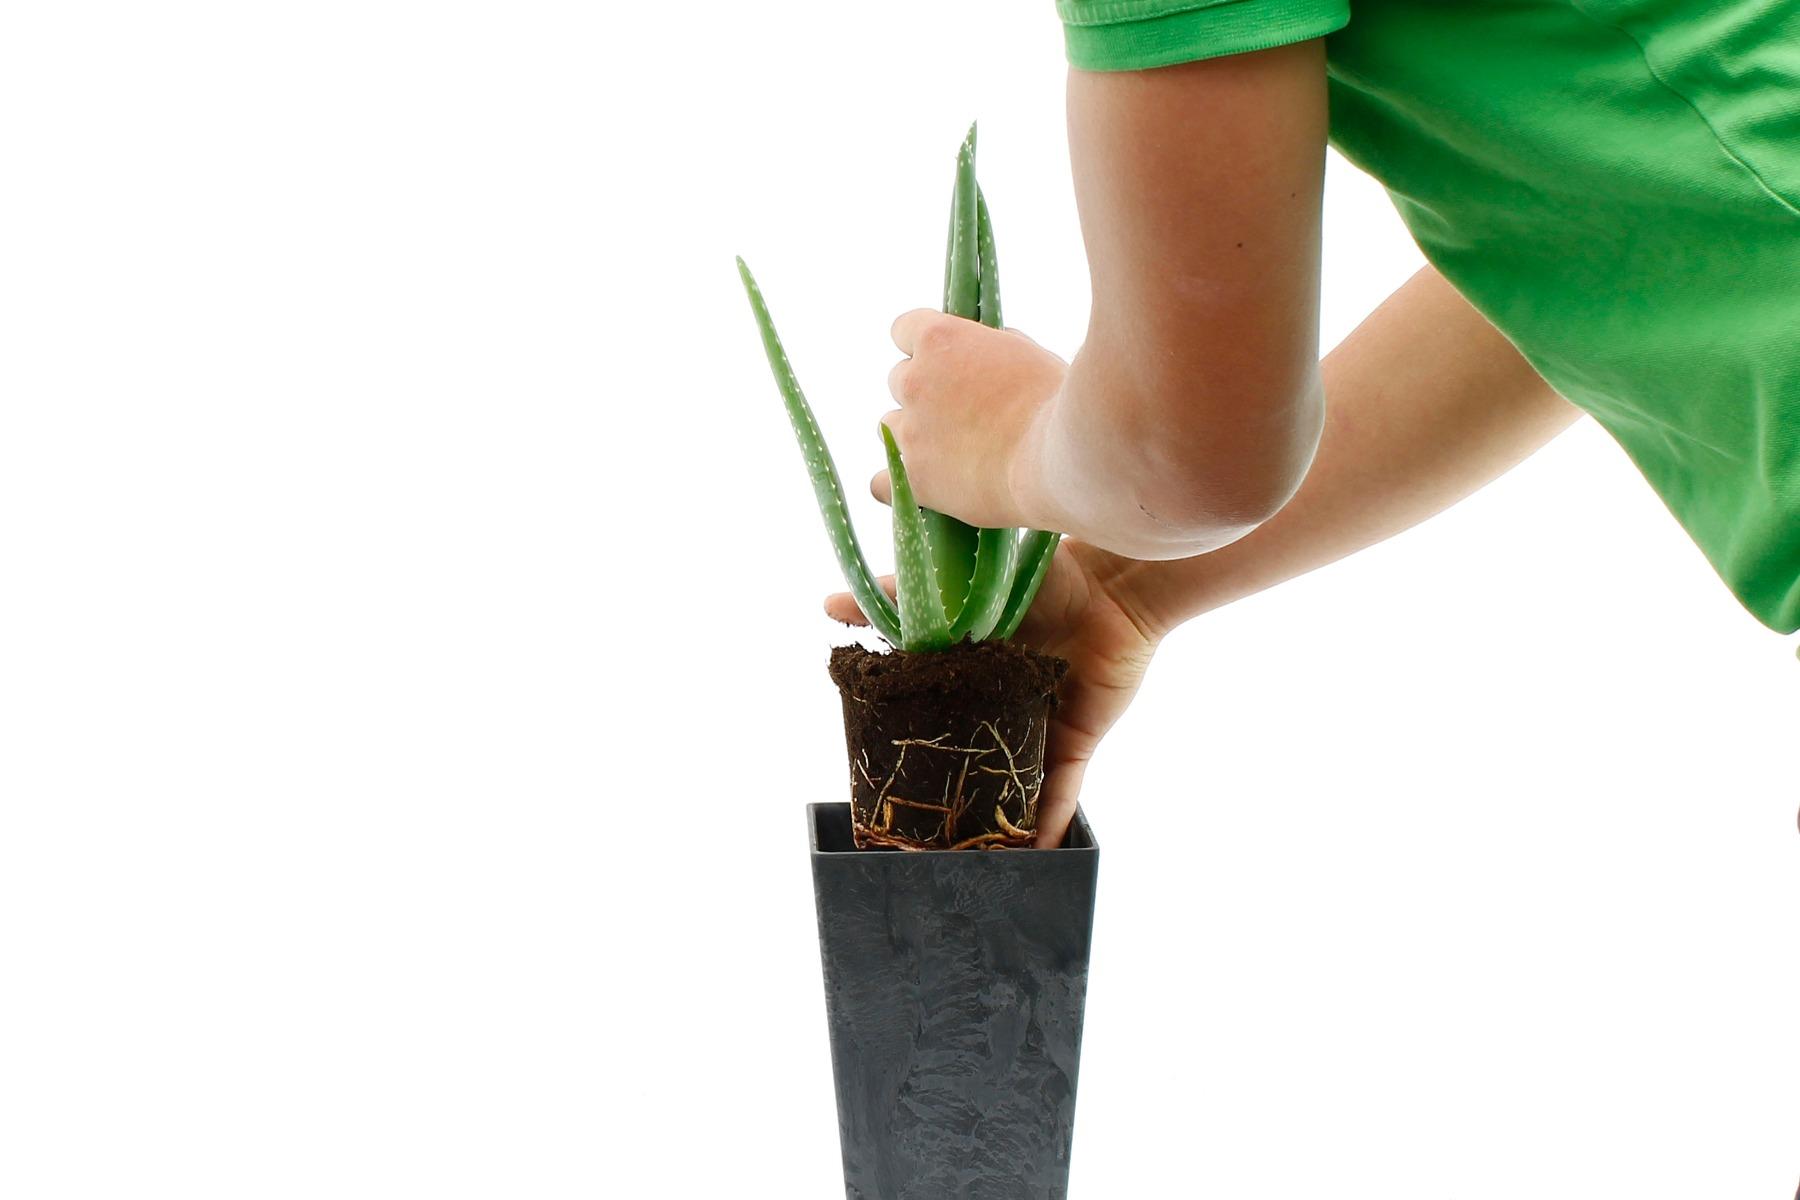 Vetplant verpotten